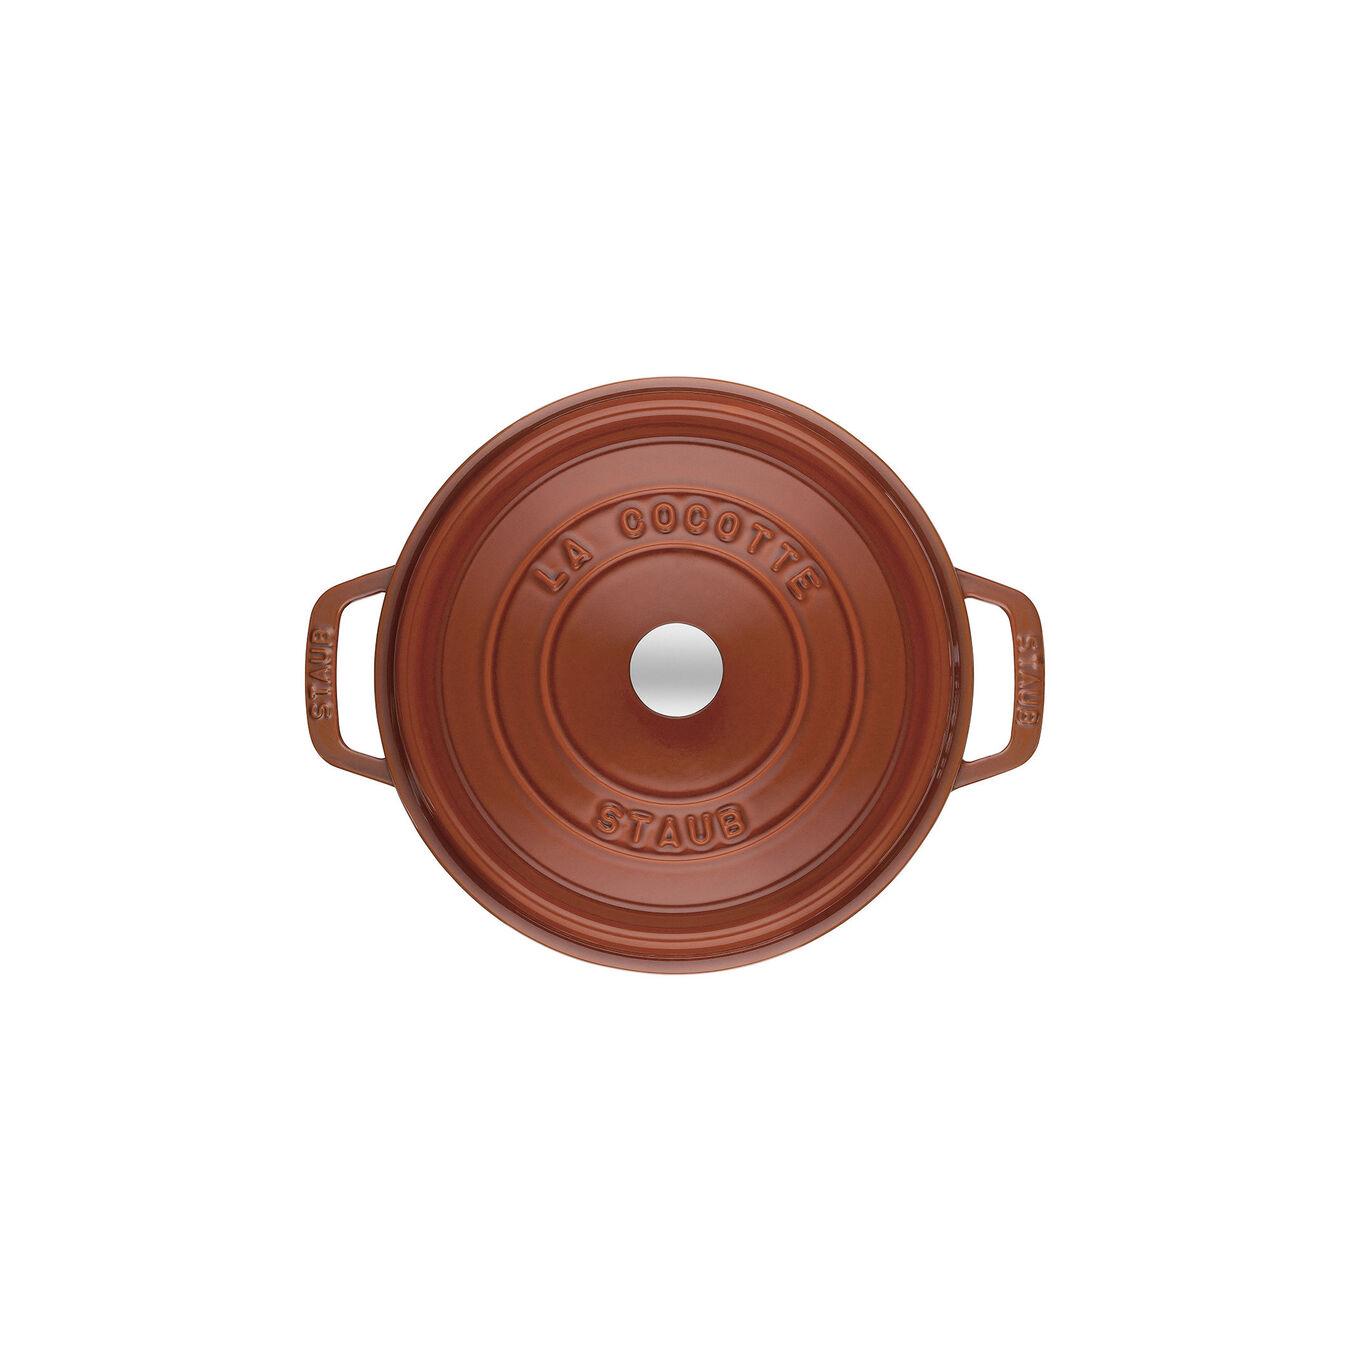 Cocotte 22 cm, rund, Zimt, Gusseisen,,large 2